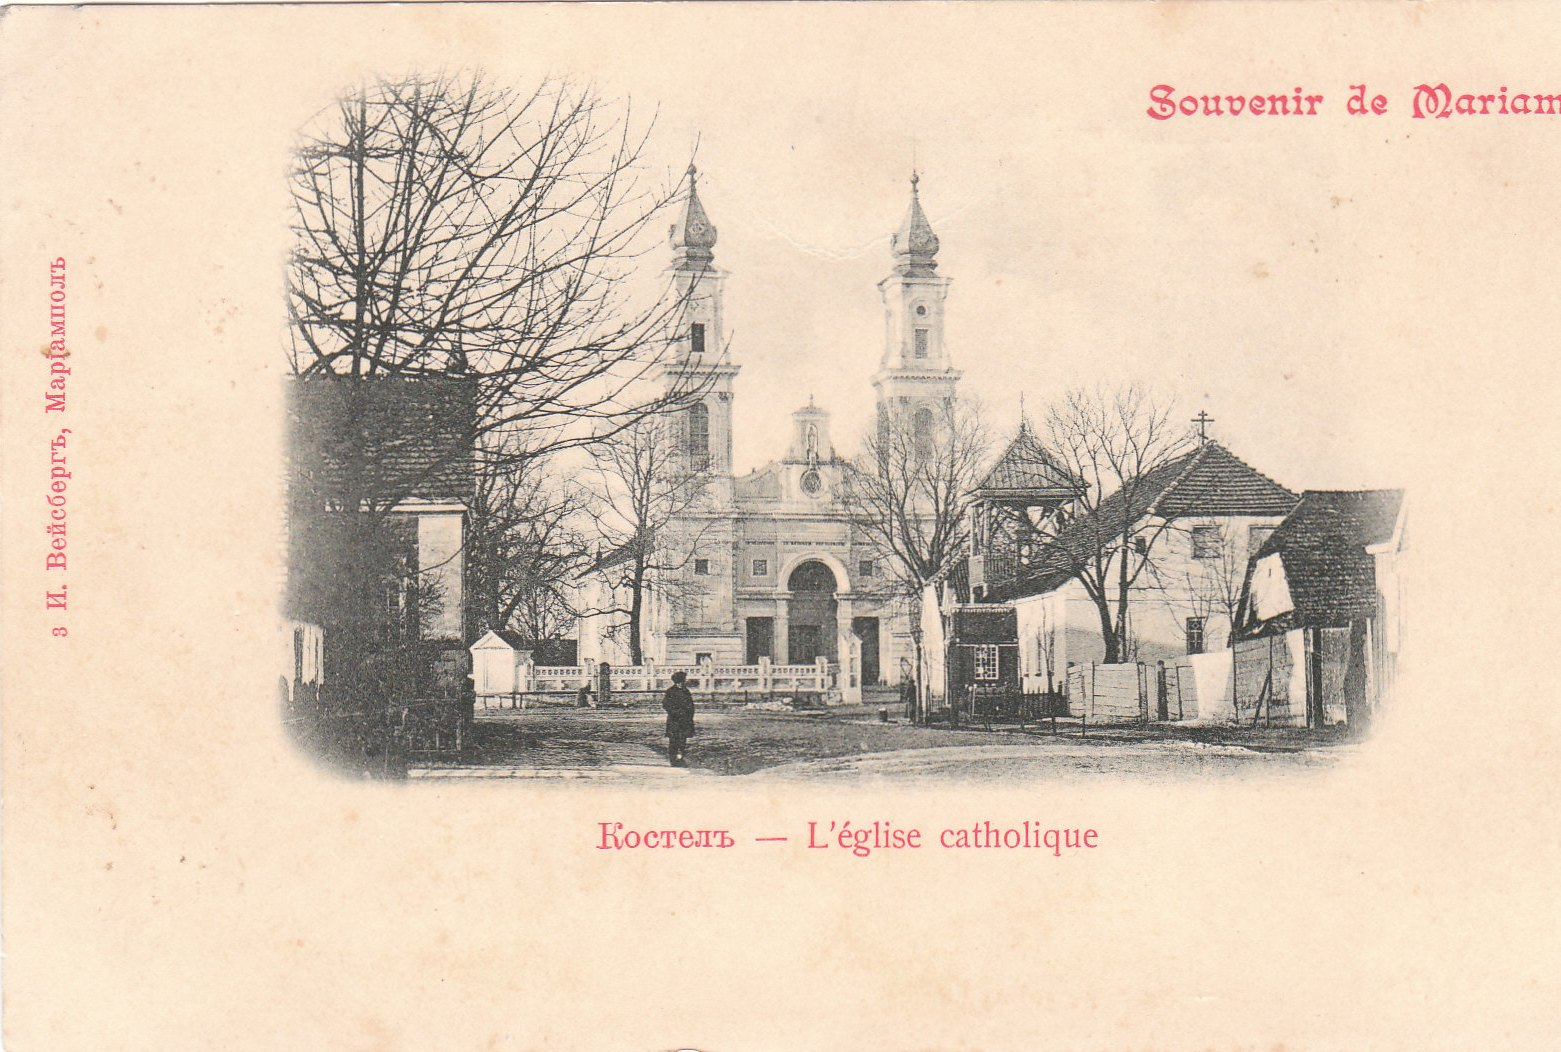 Marijampolė St. Archangel Michael Basilica and Marian Monastery of Priests